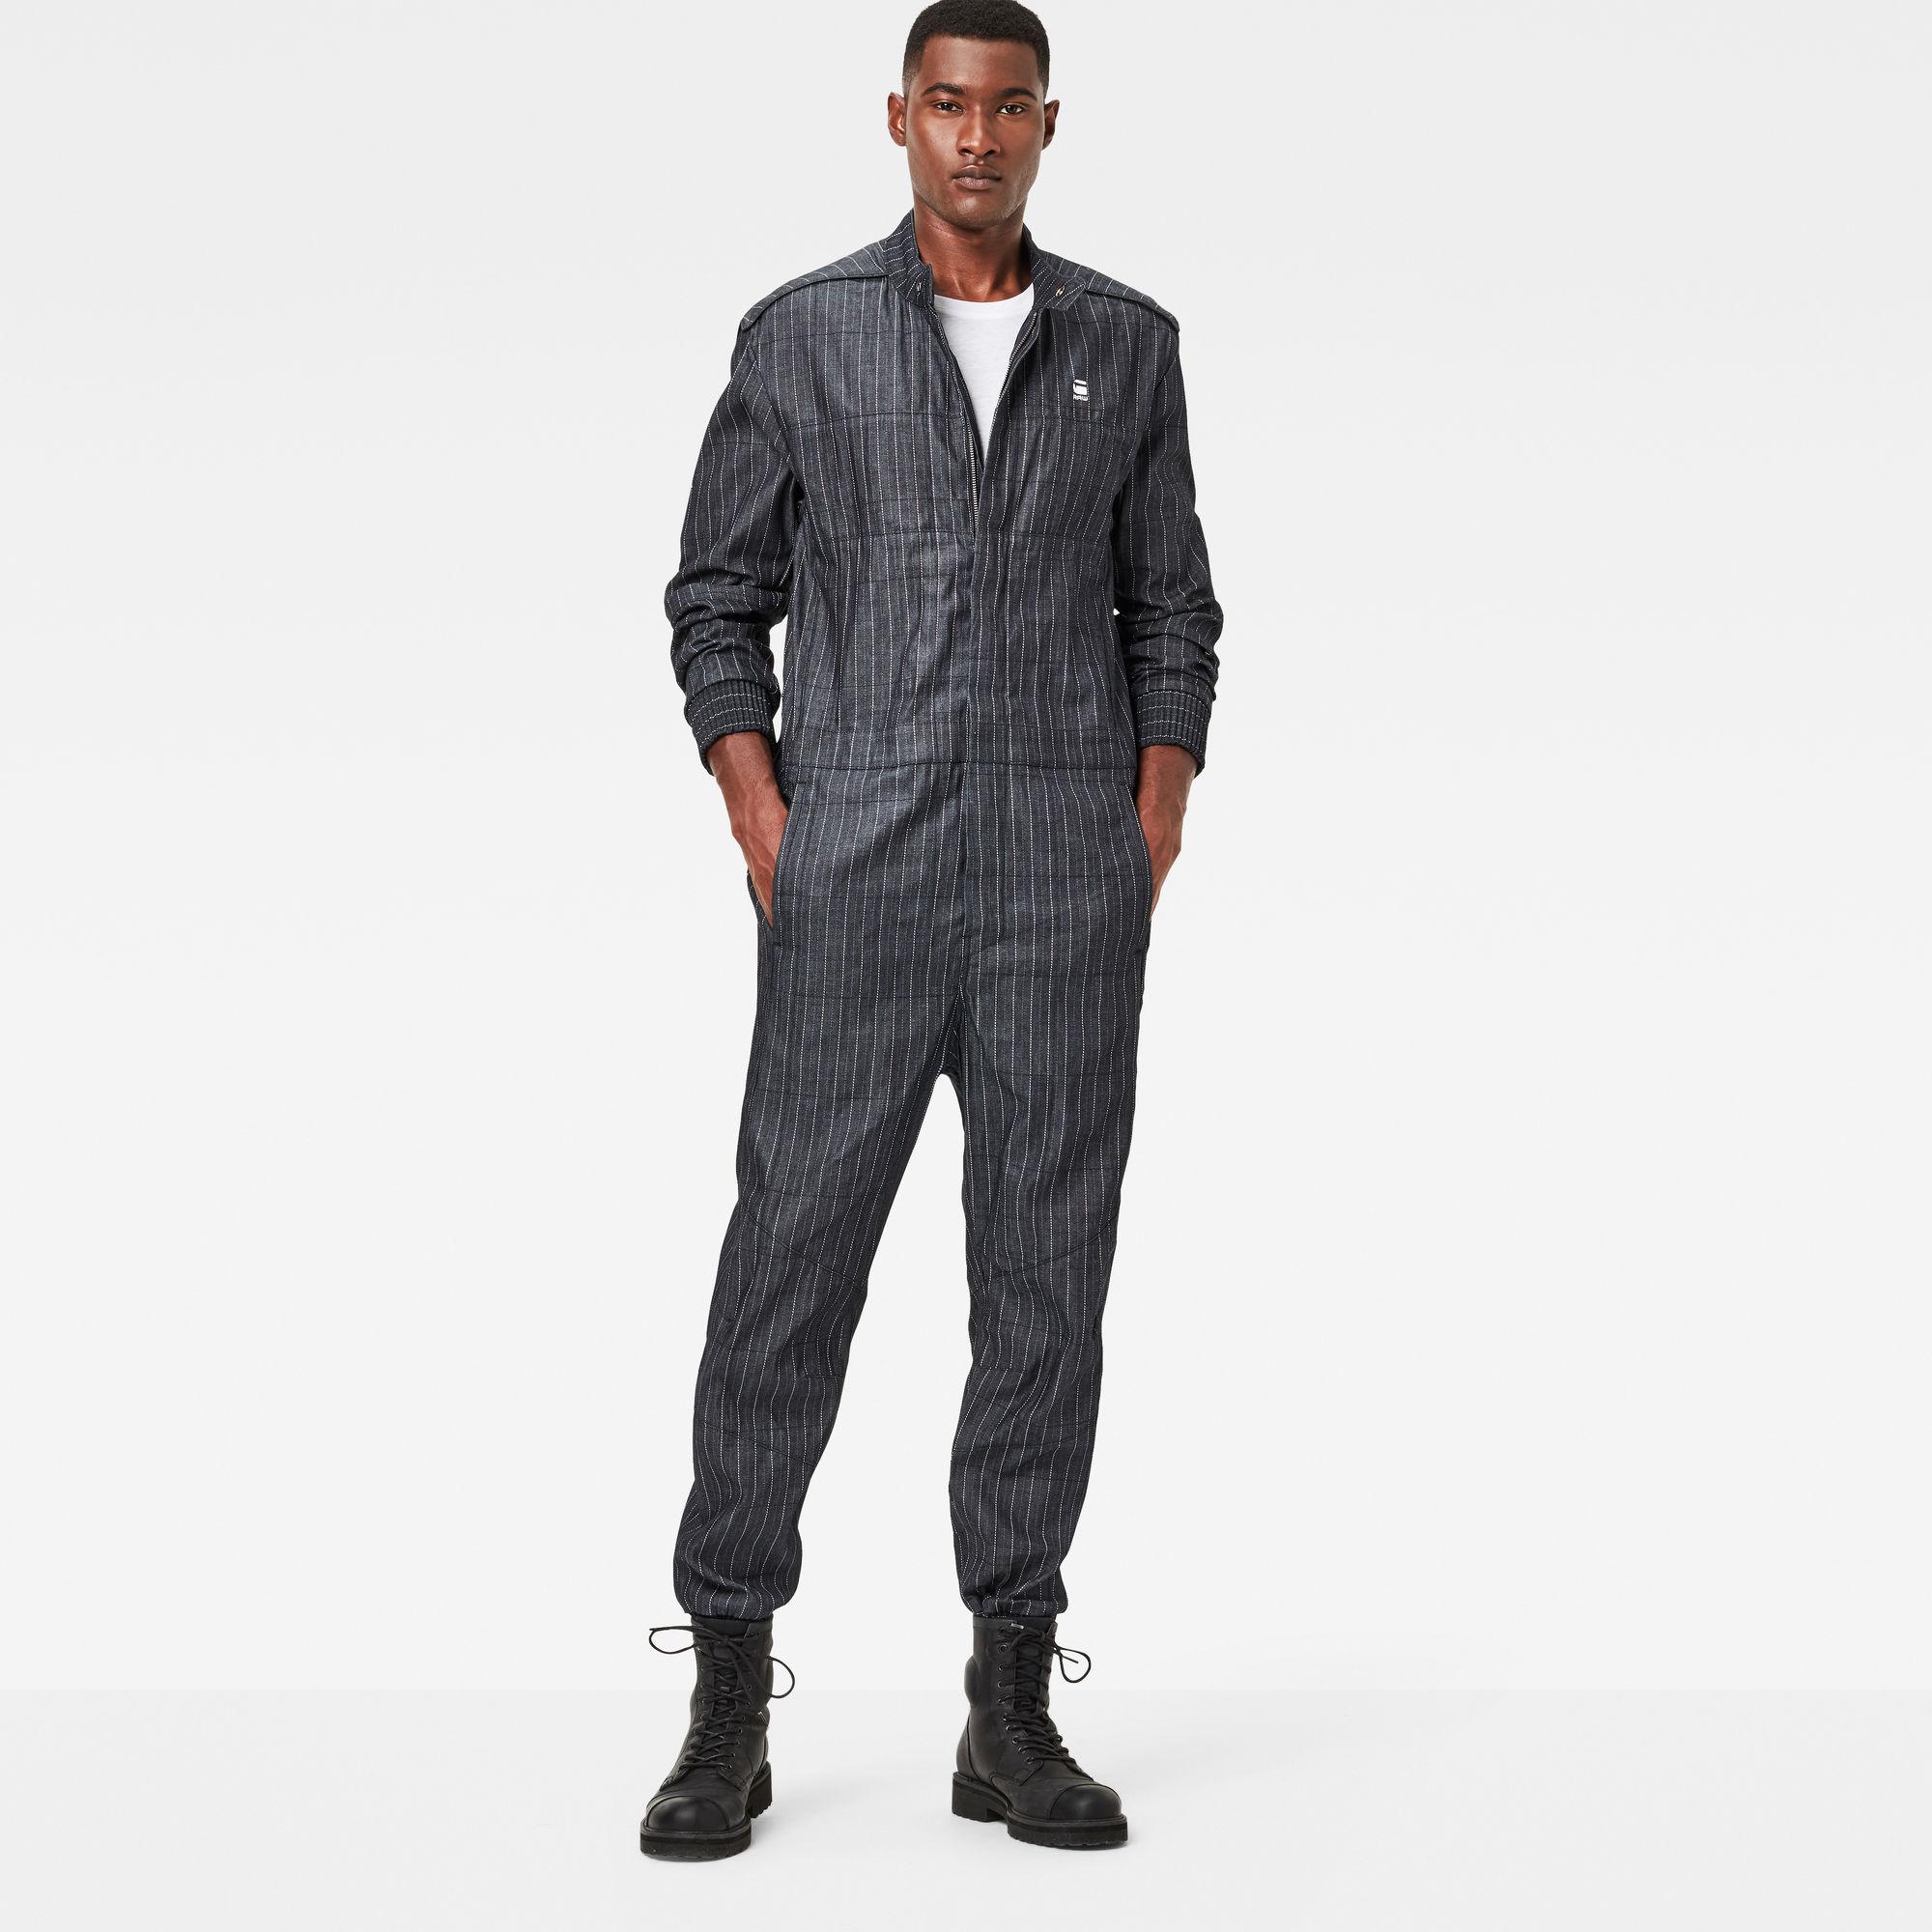 Image of G Star Raw Avernus Racer Suit